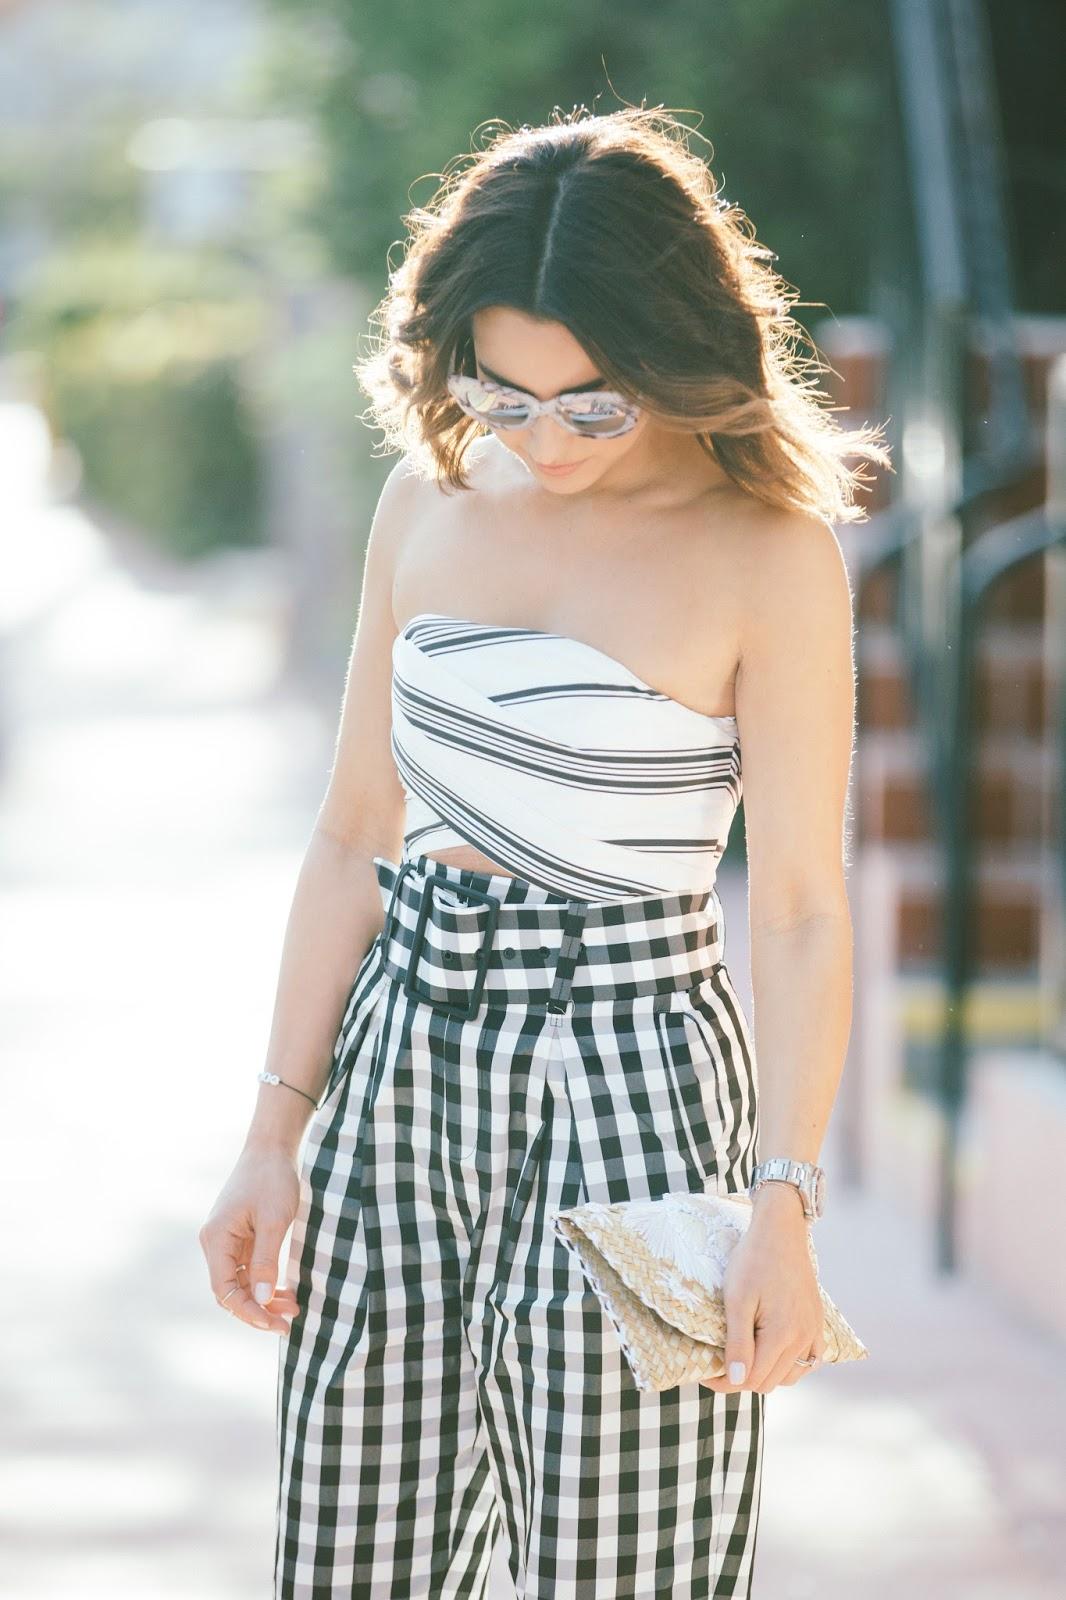 fashion-blogger-kelly-saks